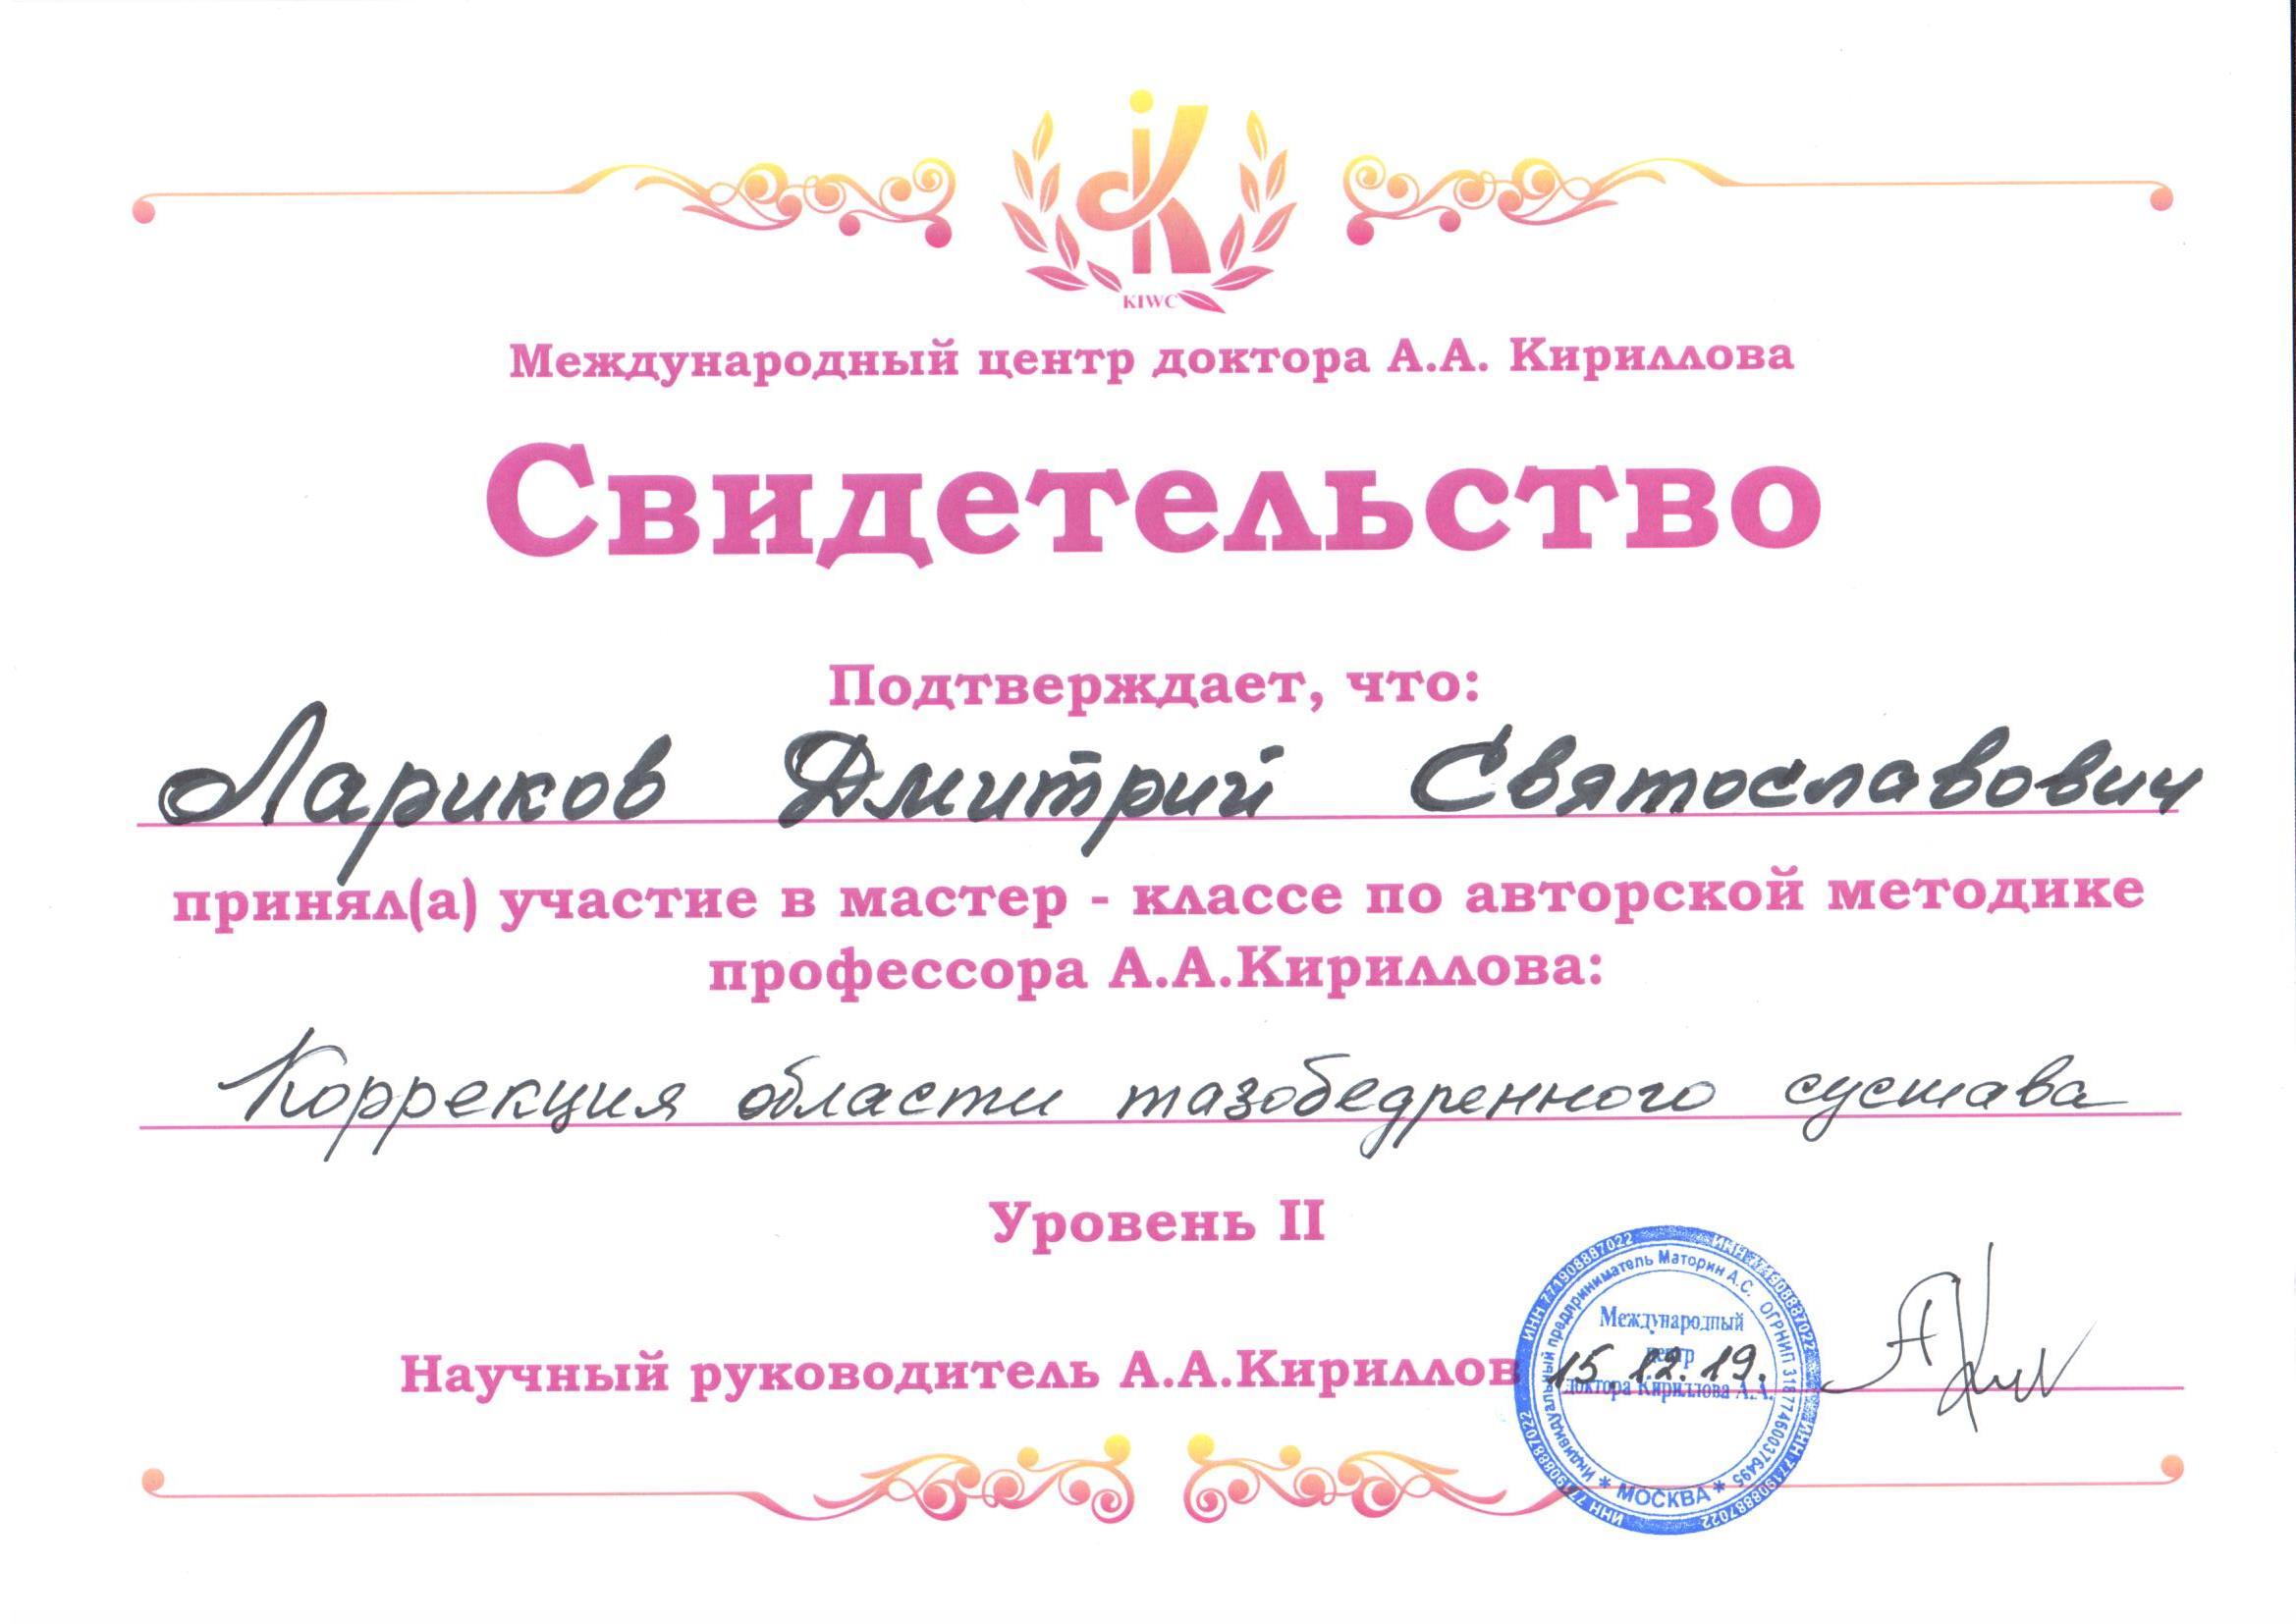 Кириллов Тазобедренный 2 11-2019